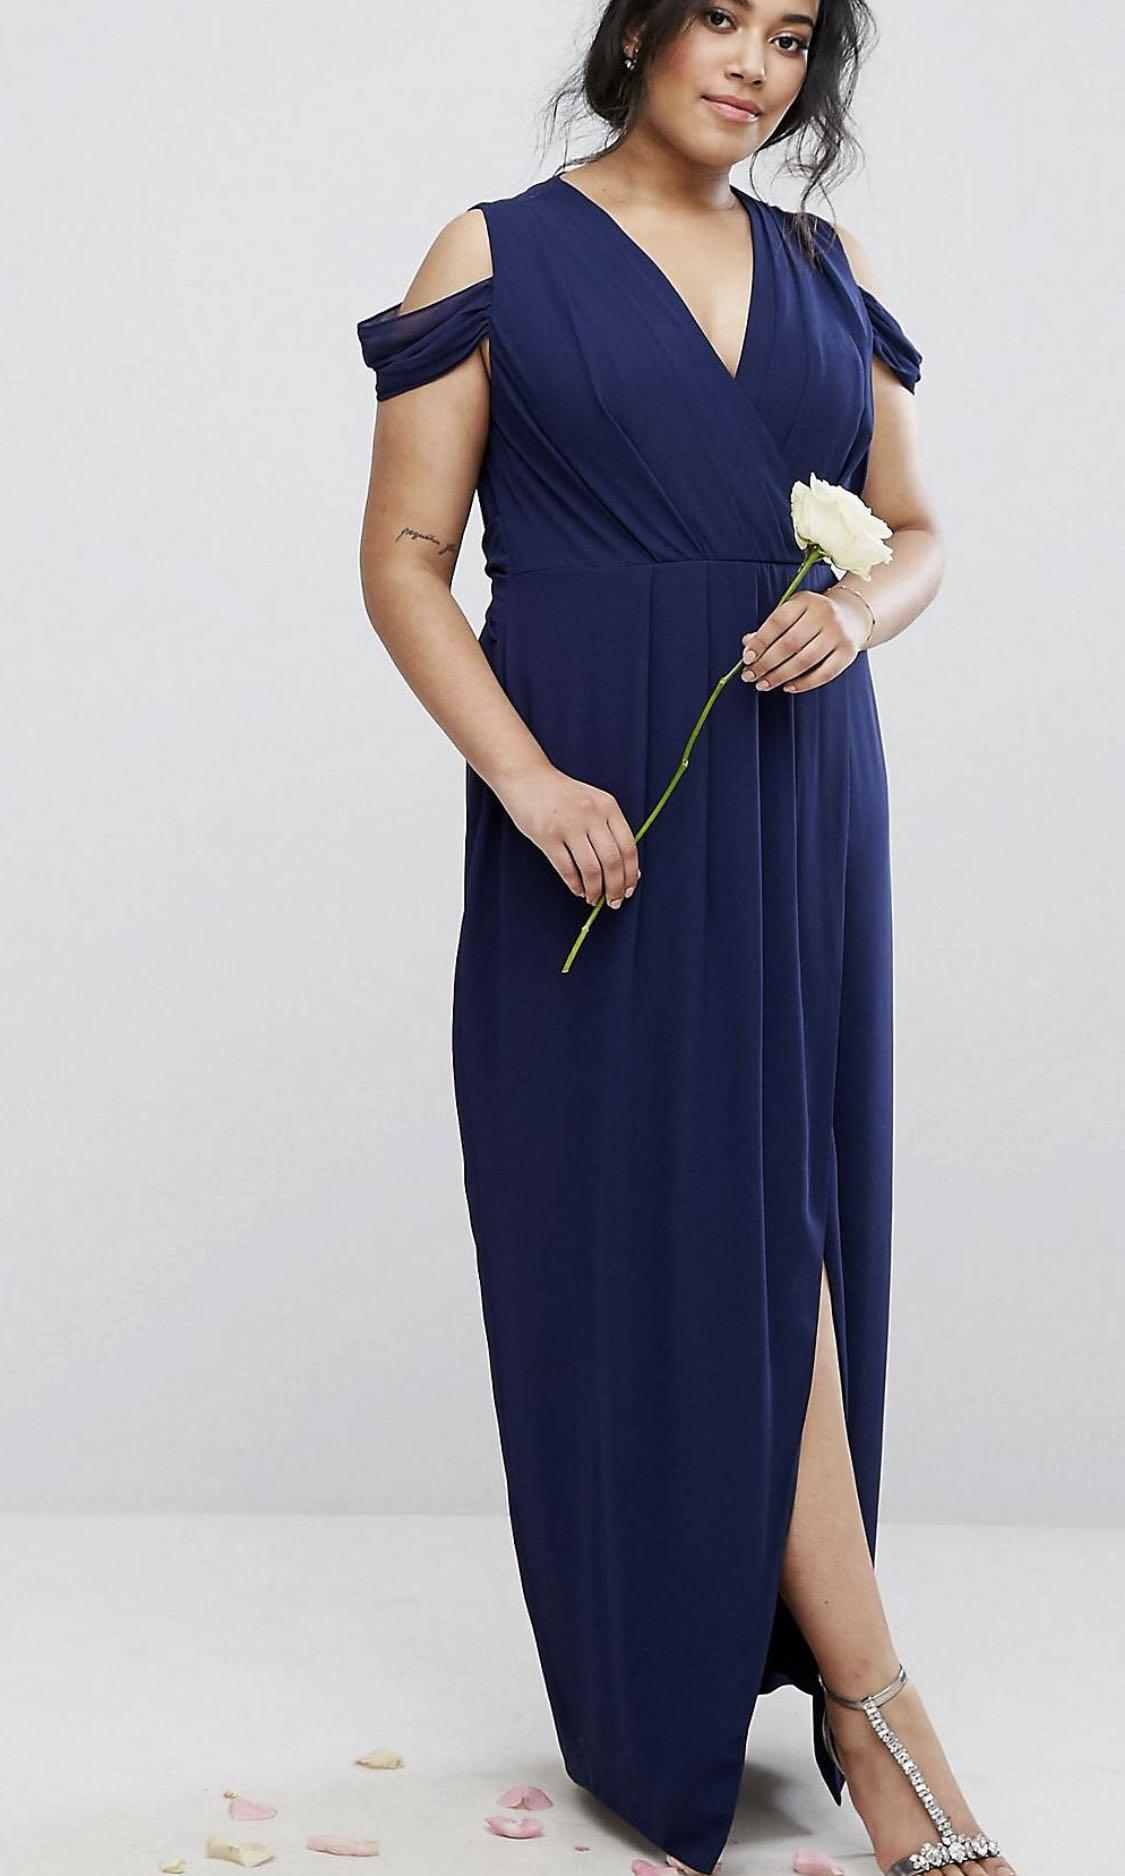 08569344590 ASOS plus size wedding navy blue Long evening dress uk18